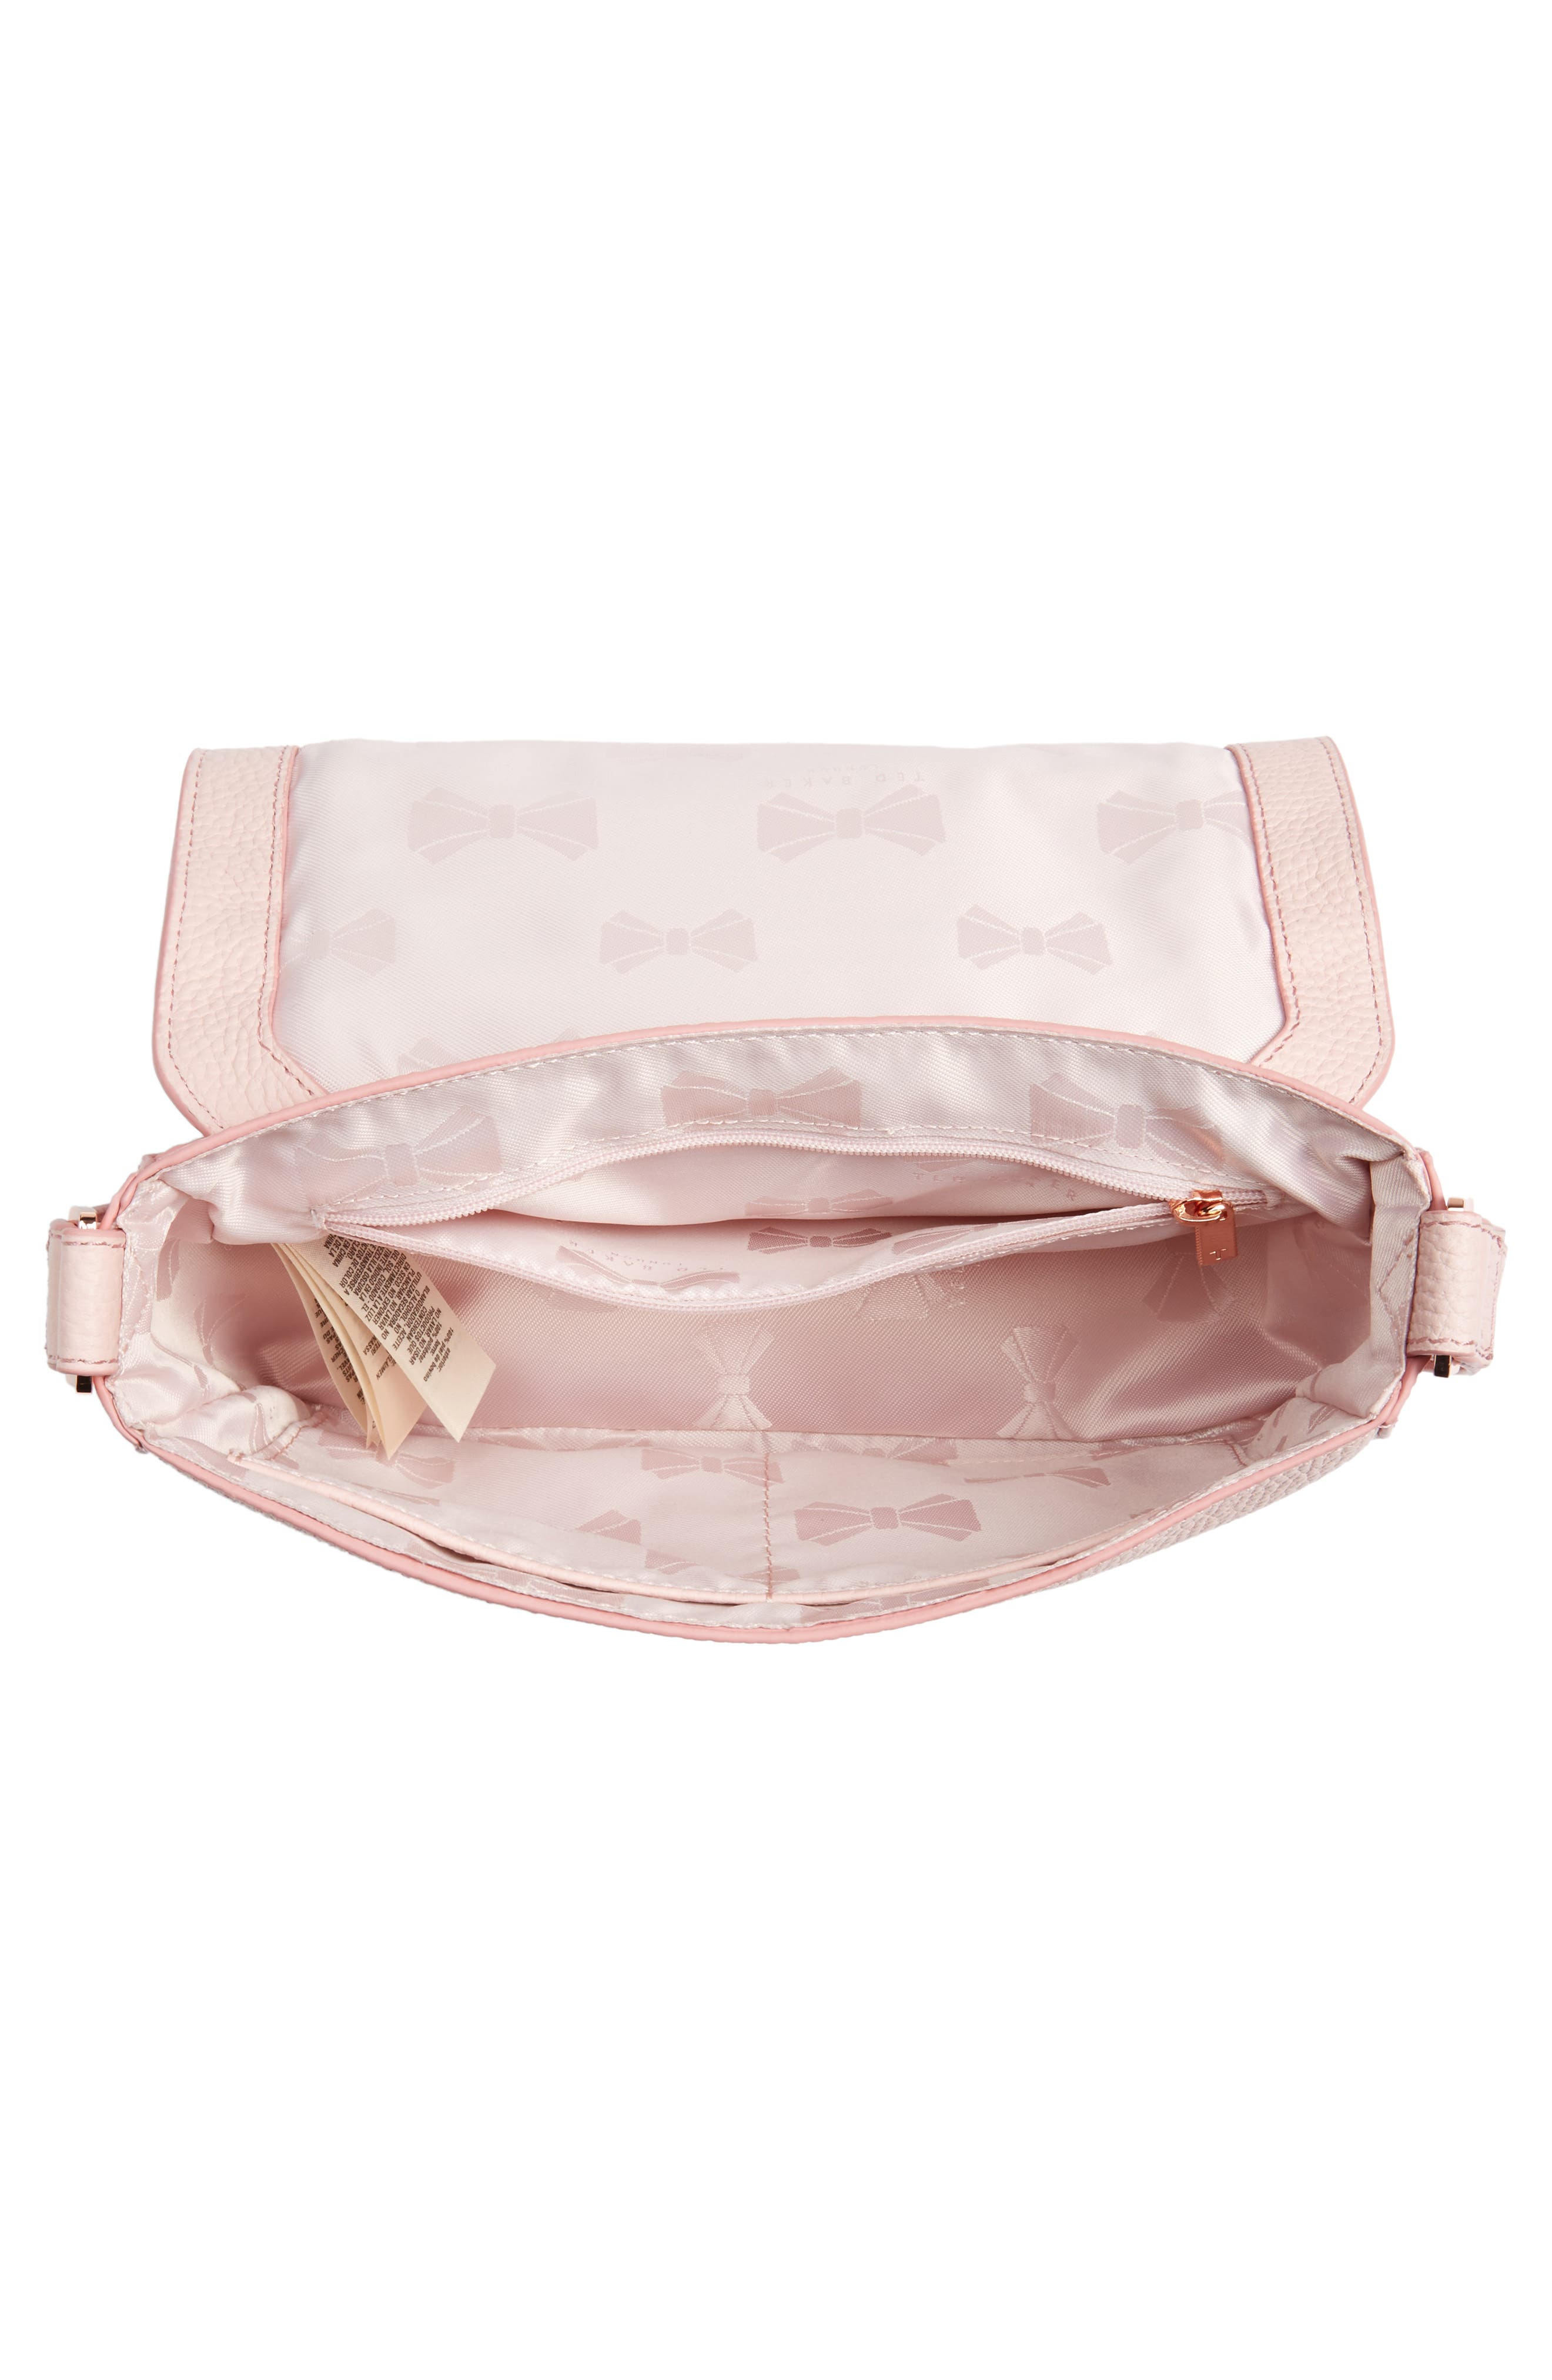 Tippi Leather Crossbody Bag,                             Alternate thumbnail 12, color,